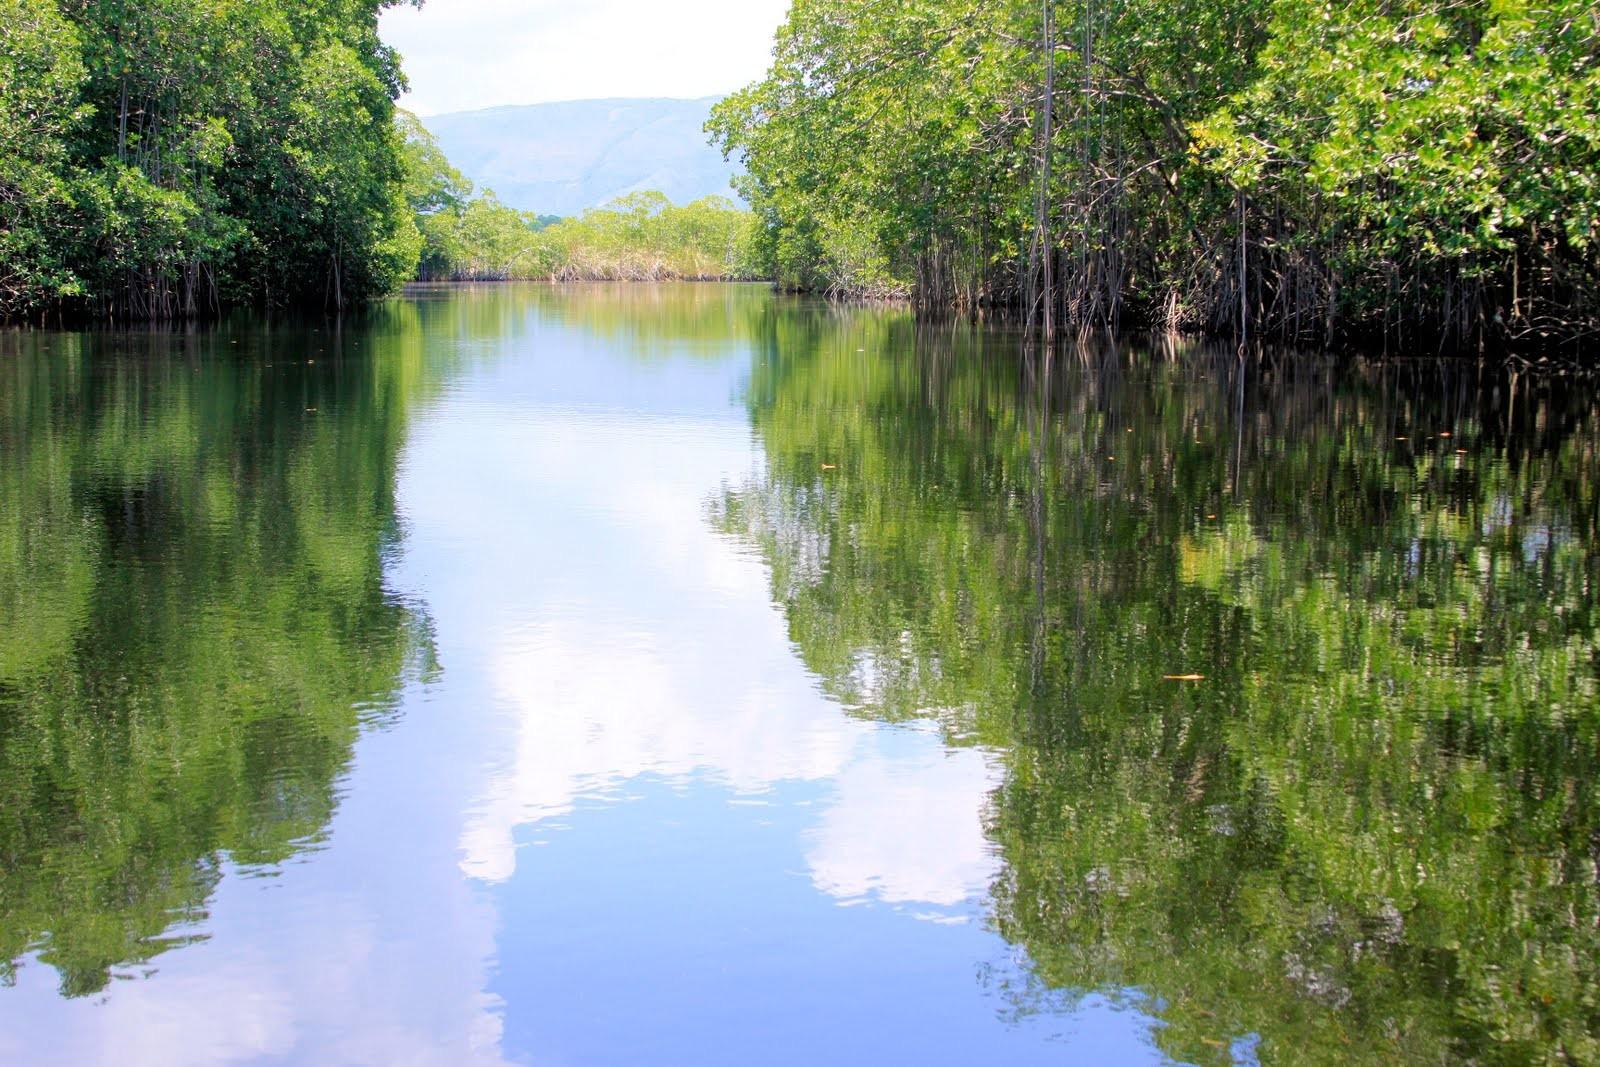 ppp_tran_tours_jamaica_tours_black_river_safari_444_2_1_2_2